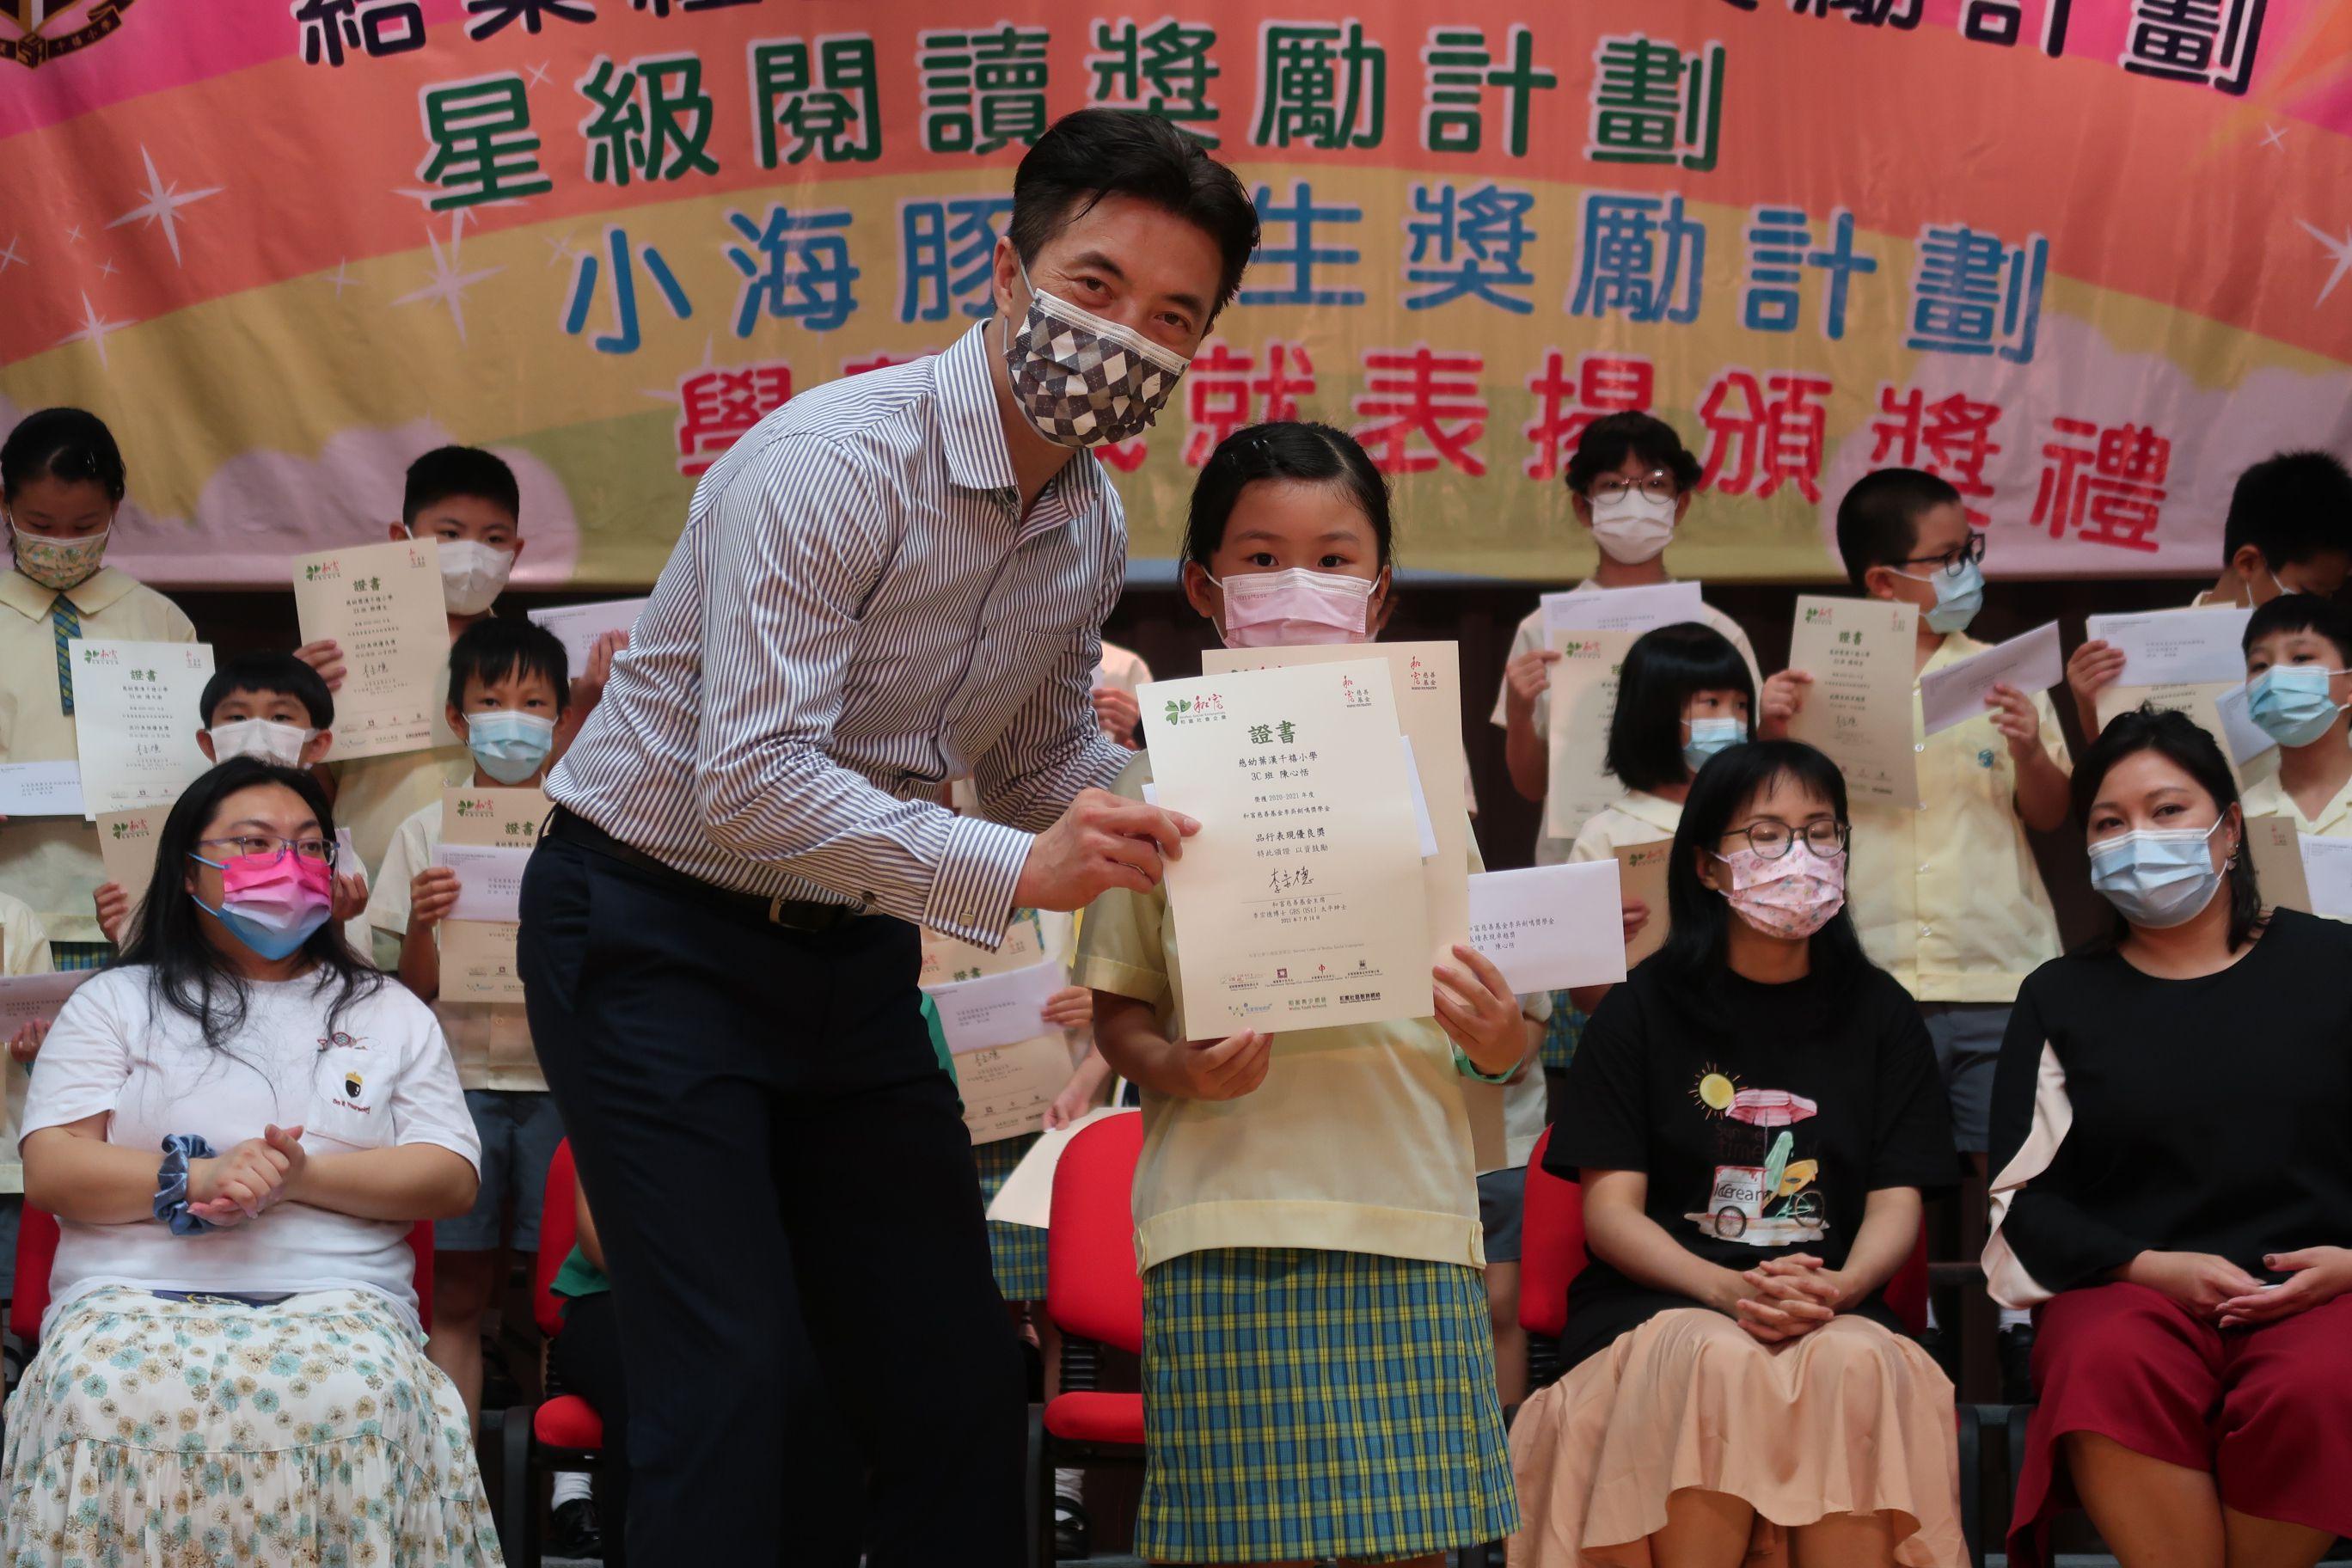 https://syh.edu.hk/sites/default/files/img_5962_1.jpg